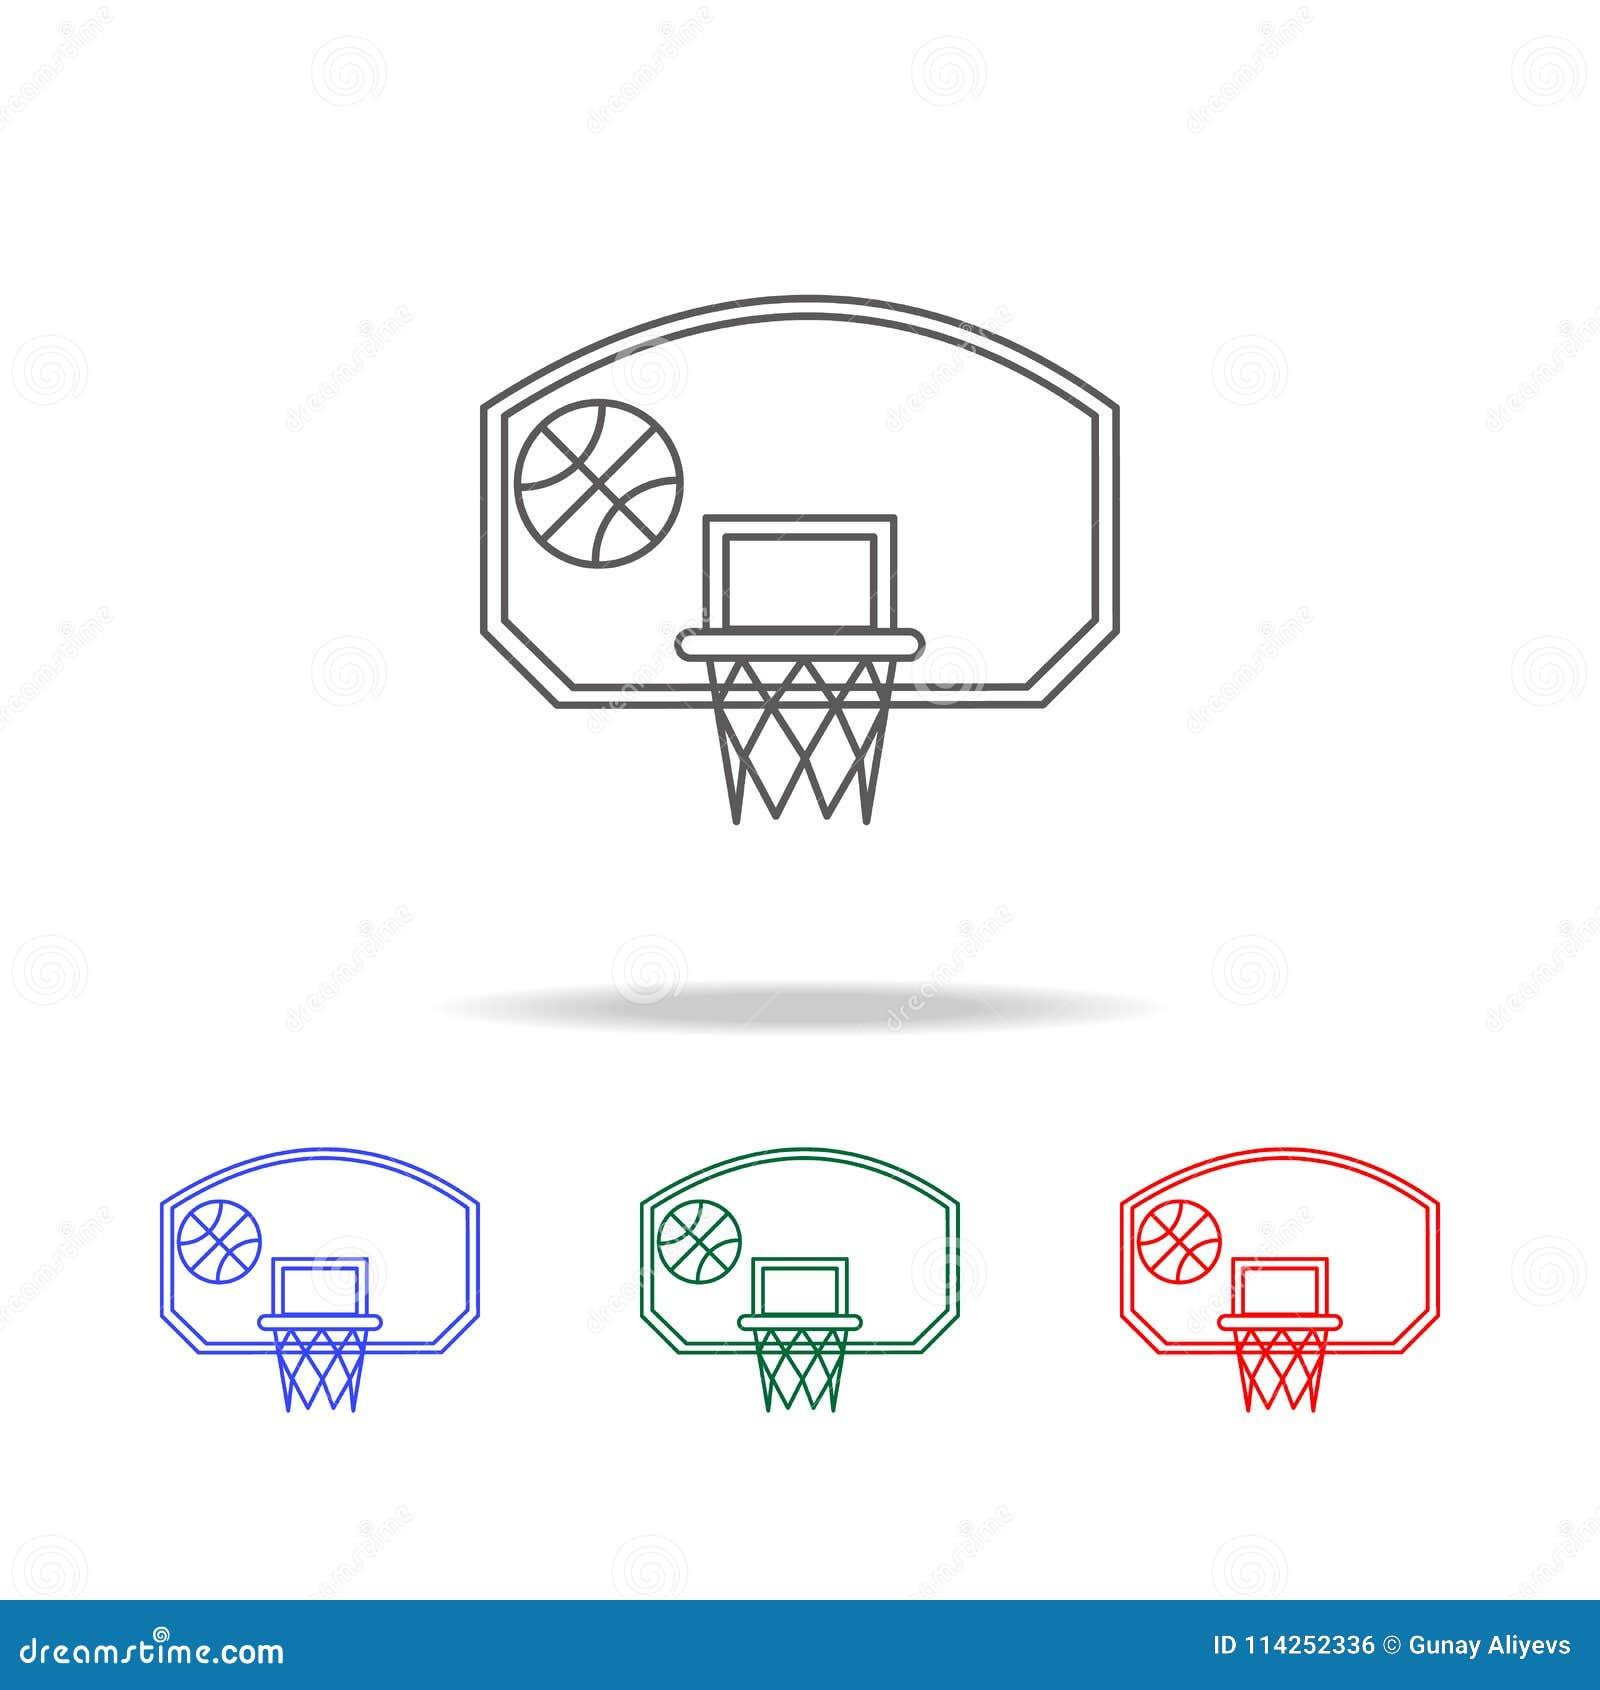 Lujo Hoja Para Colorear De Baloncesto Modelo - Ideas Para Colorear ...